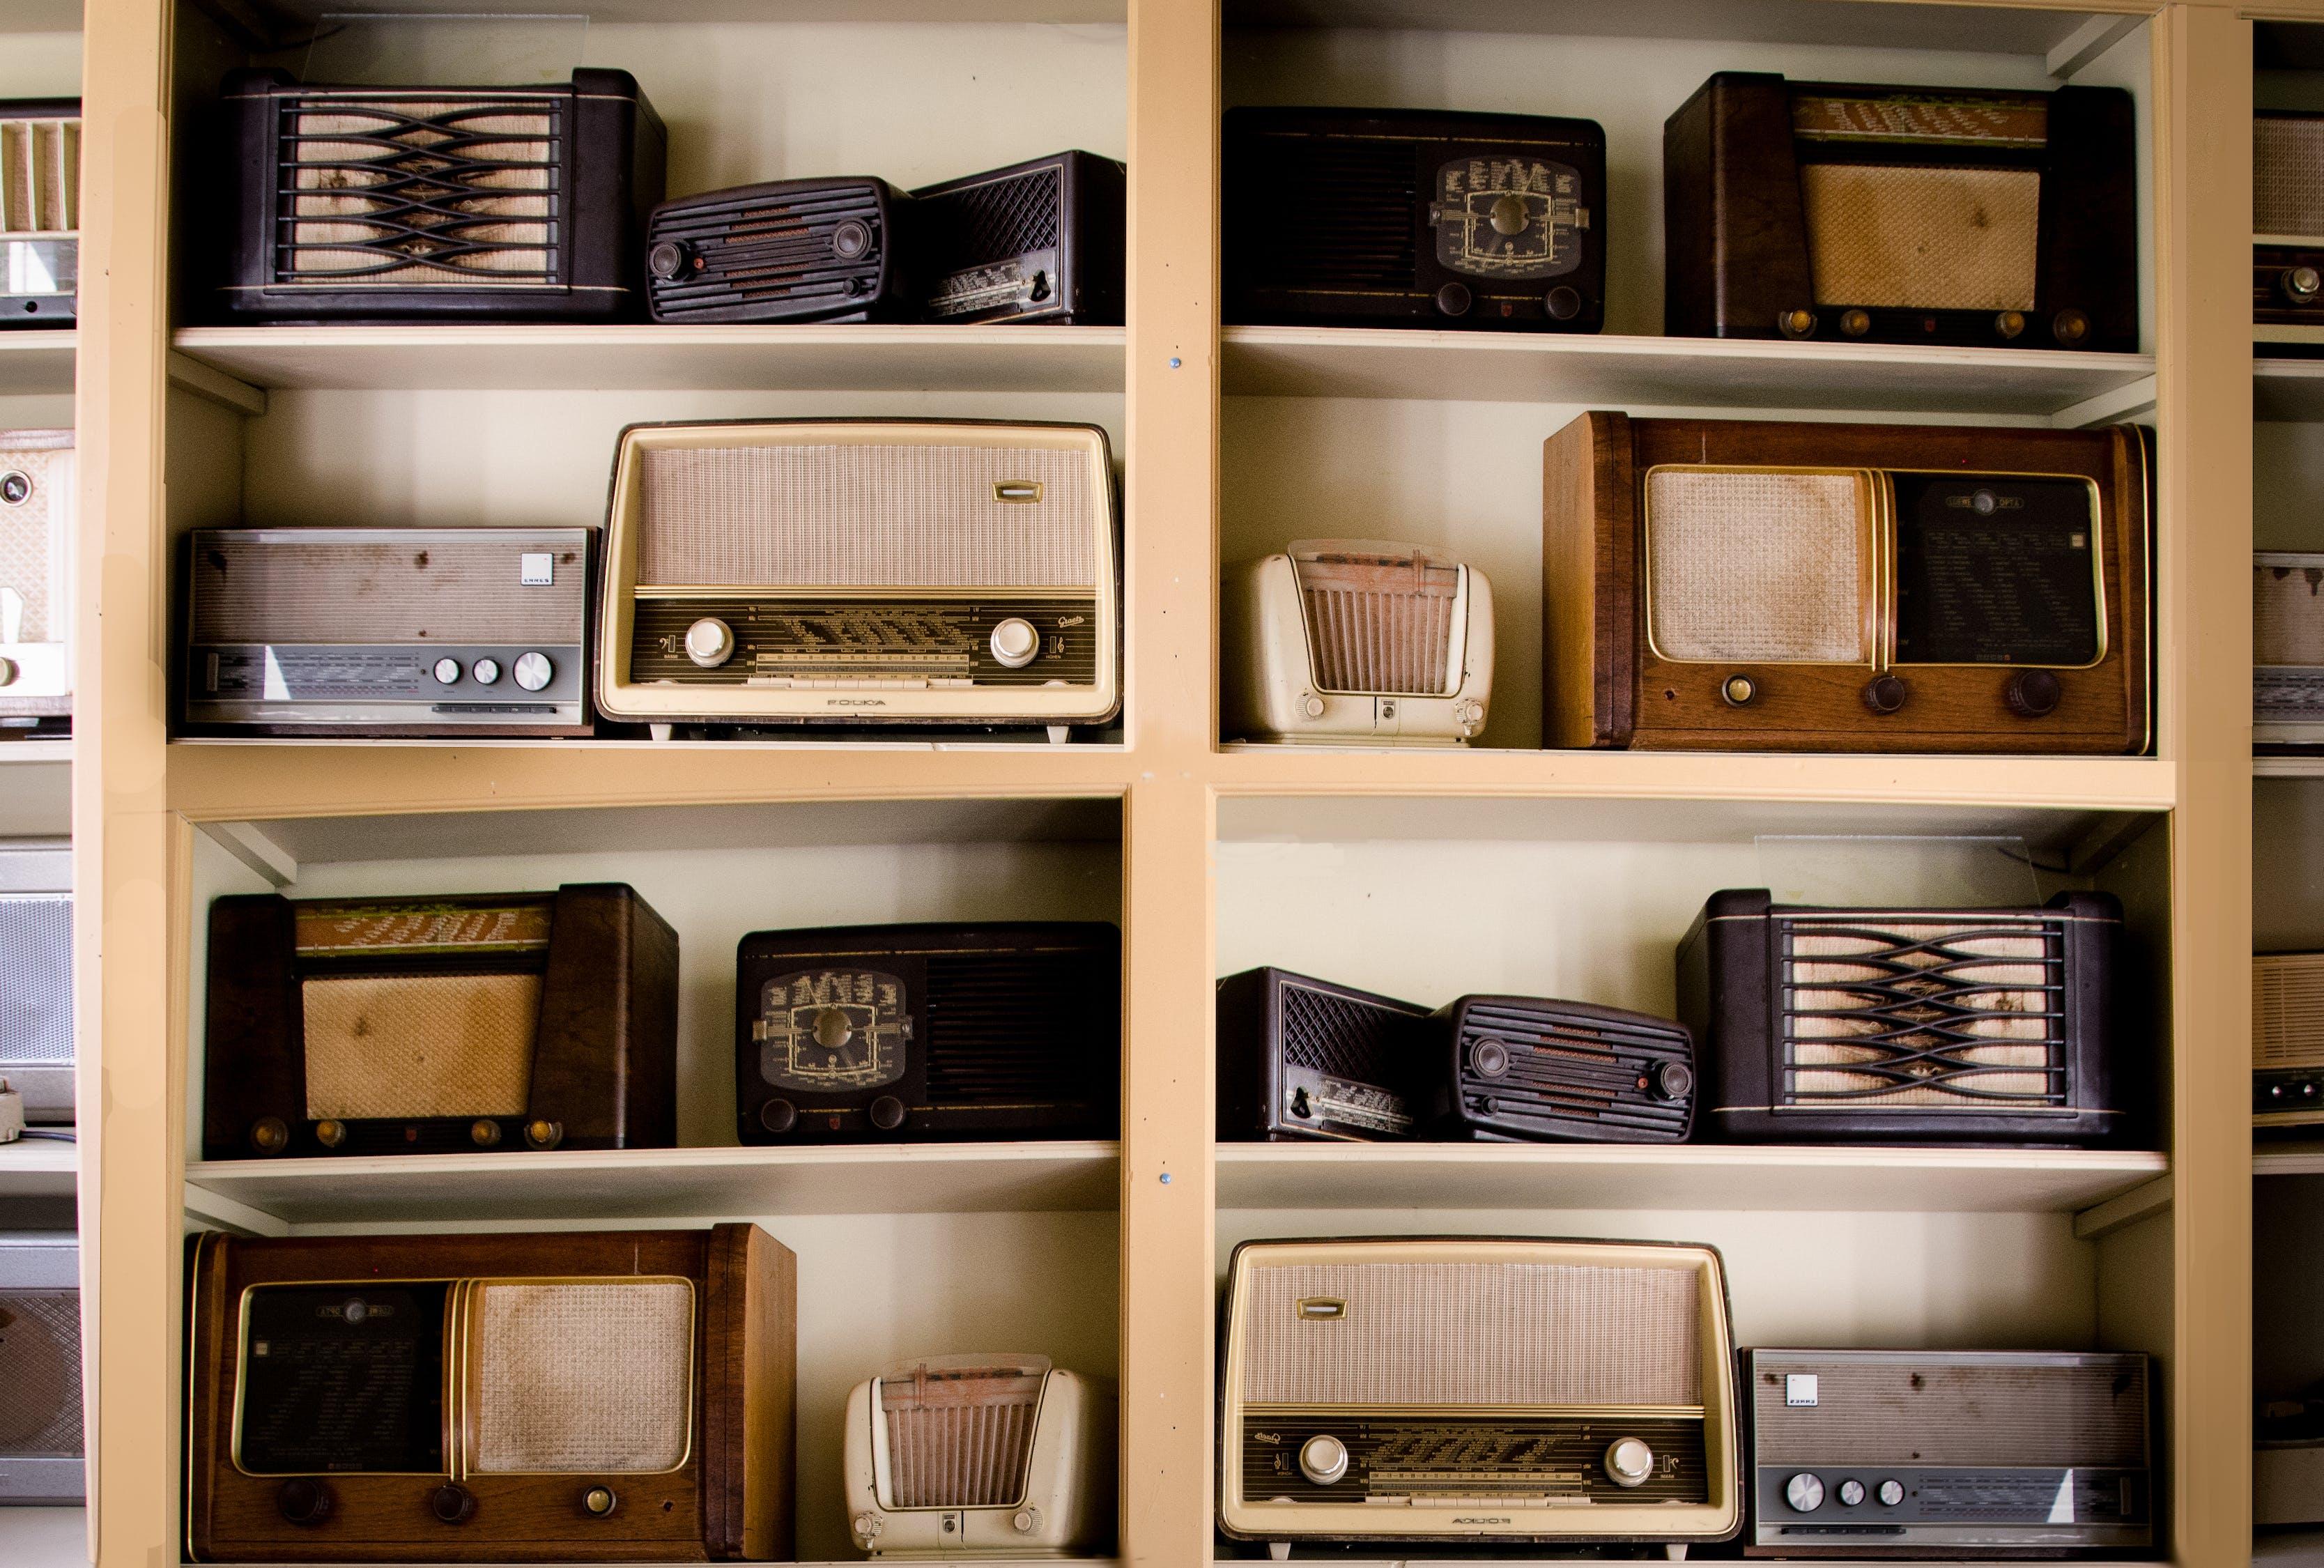 https://images.pexels.com/photos/9295/vintage-music-business-shop.jpg?auto=compress&cs=tinysrgb&dpr=3&h=750&w=1260